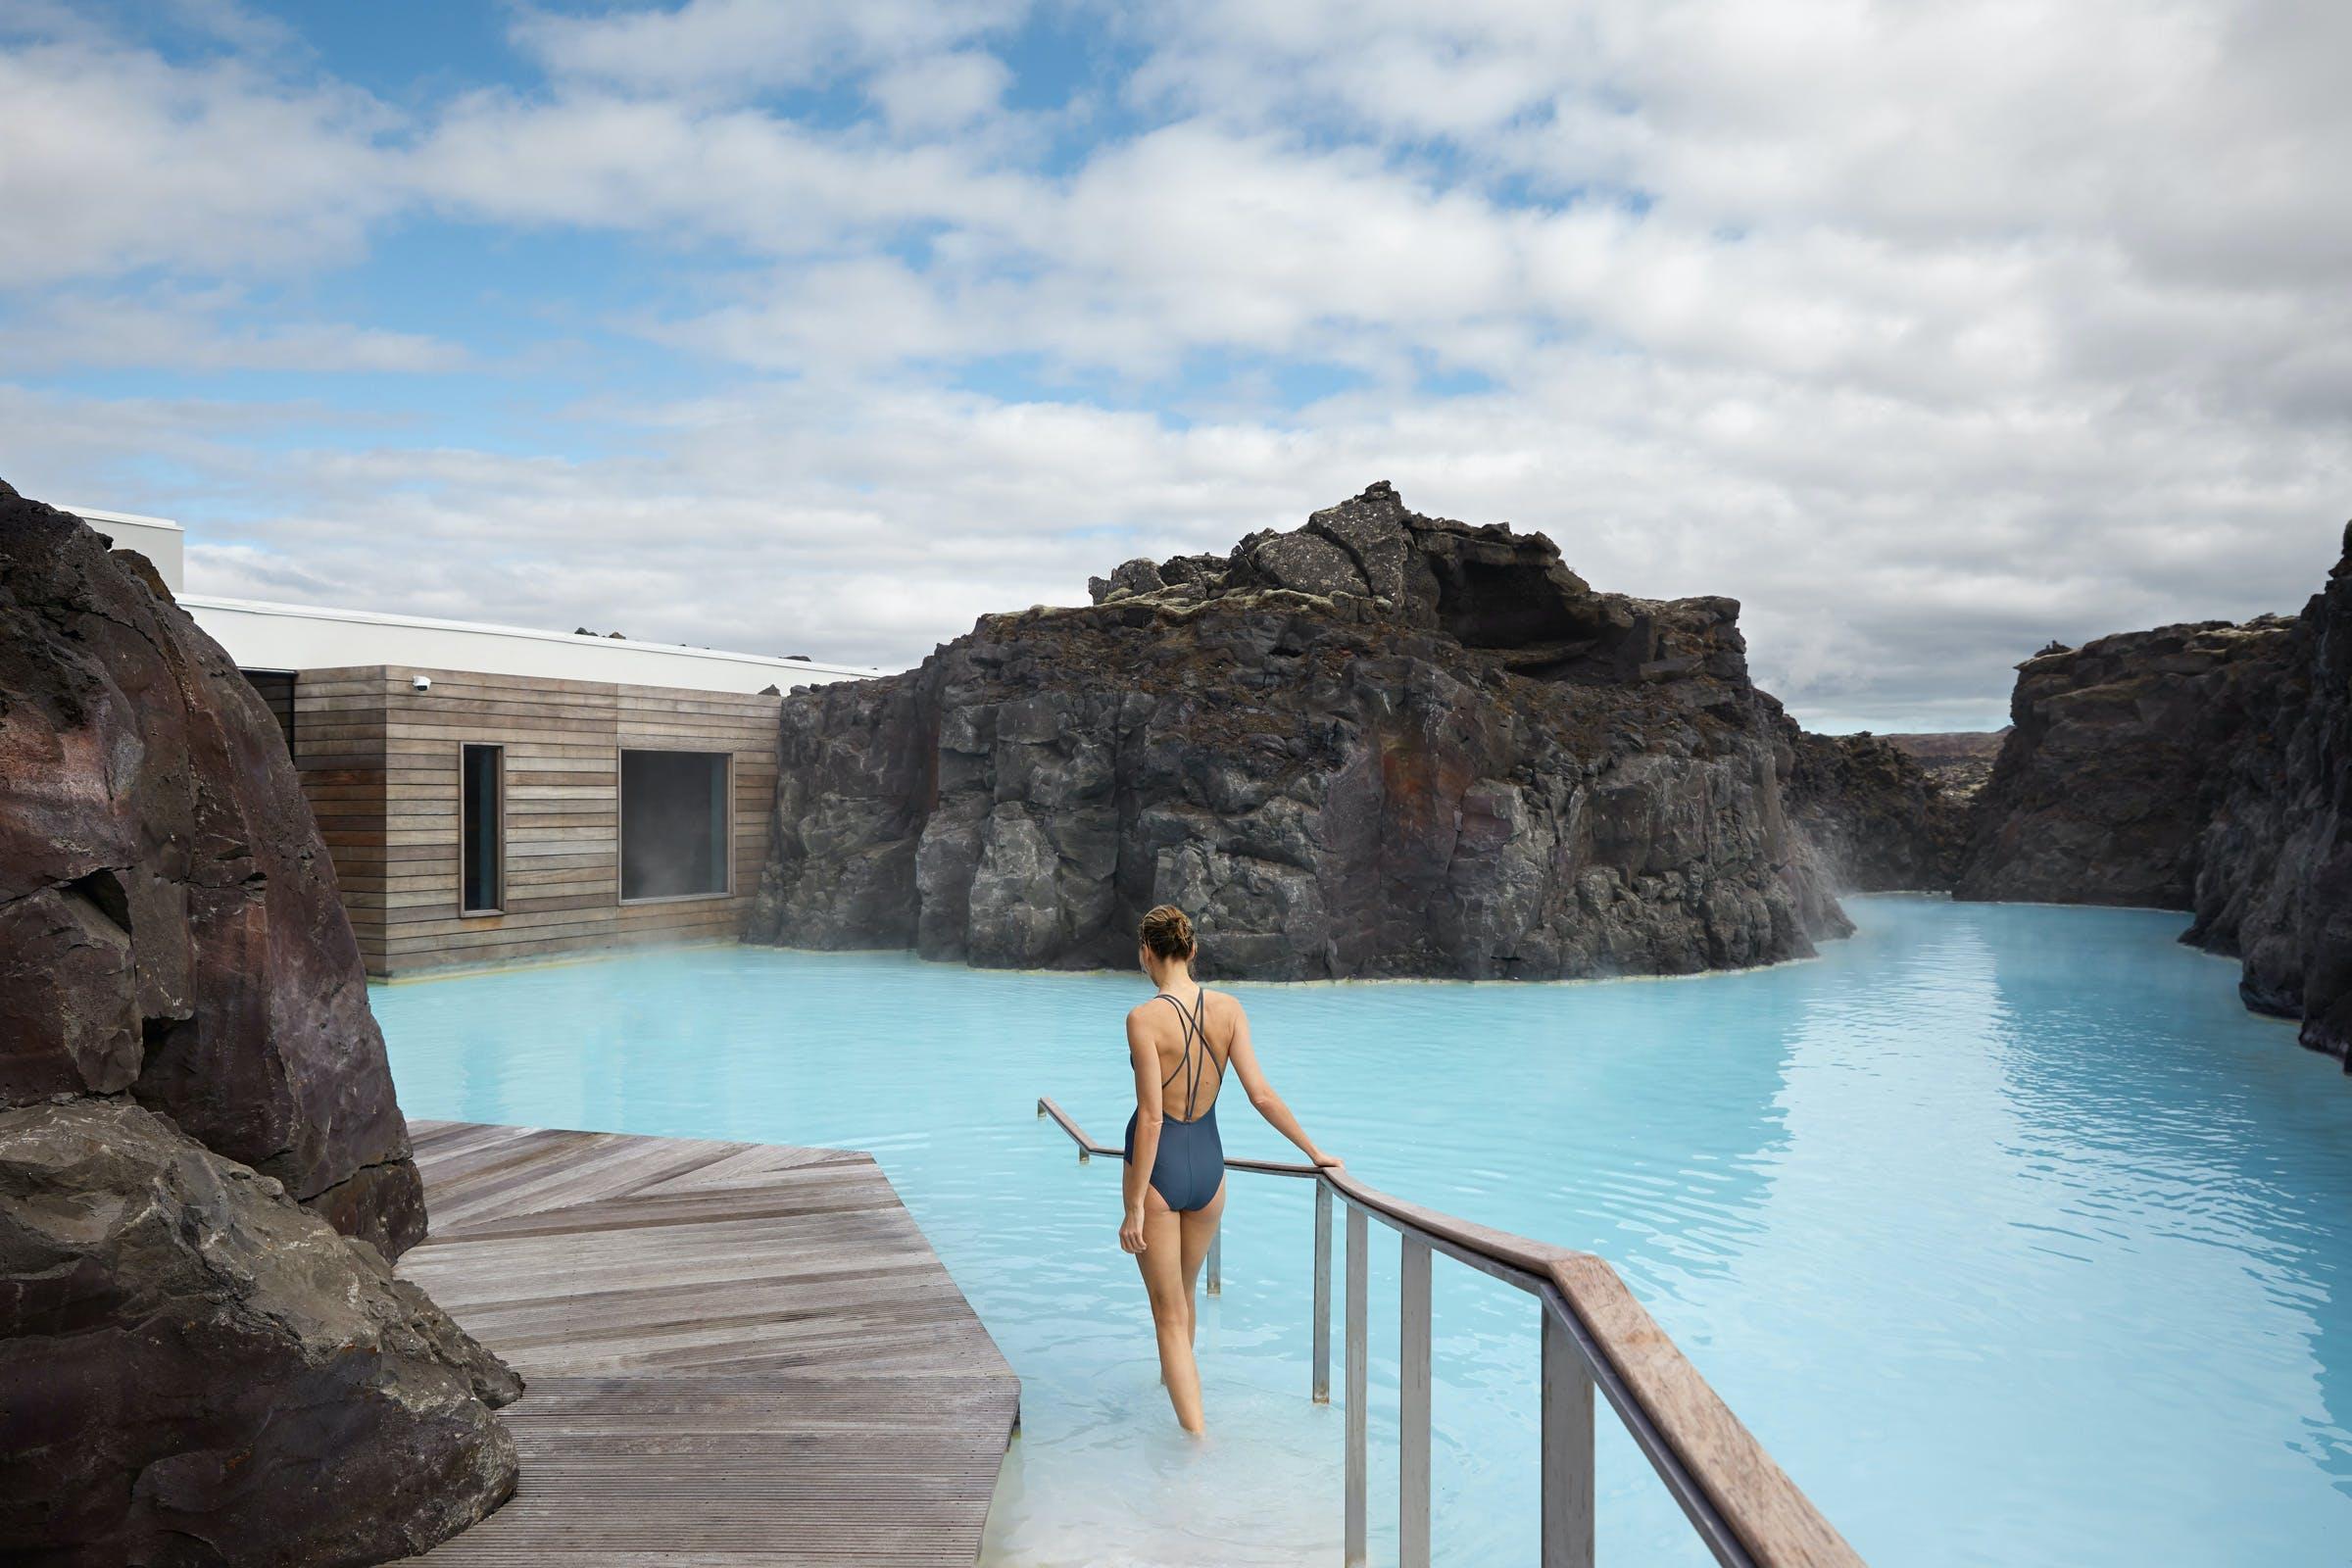 A woman bathing in the Blue lagoon retreat